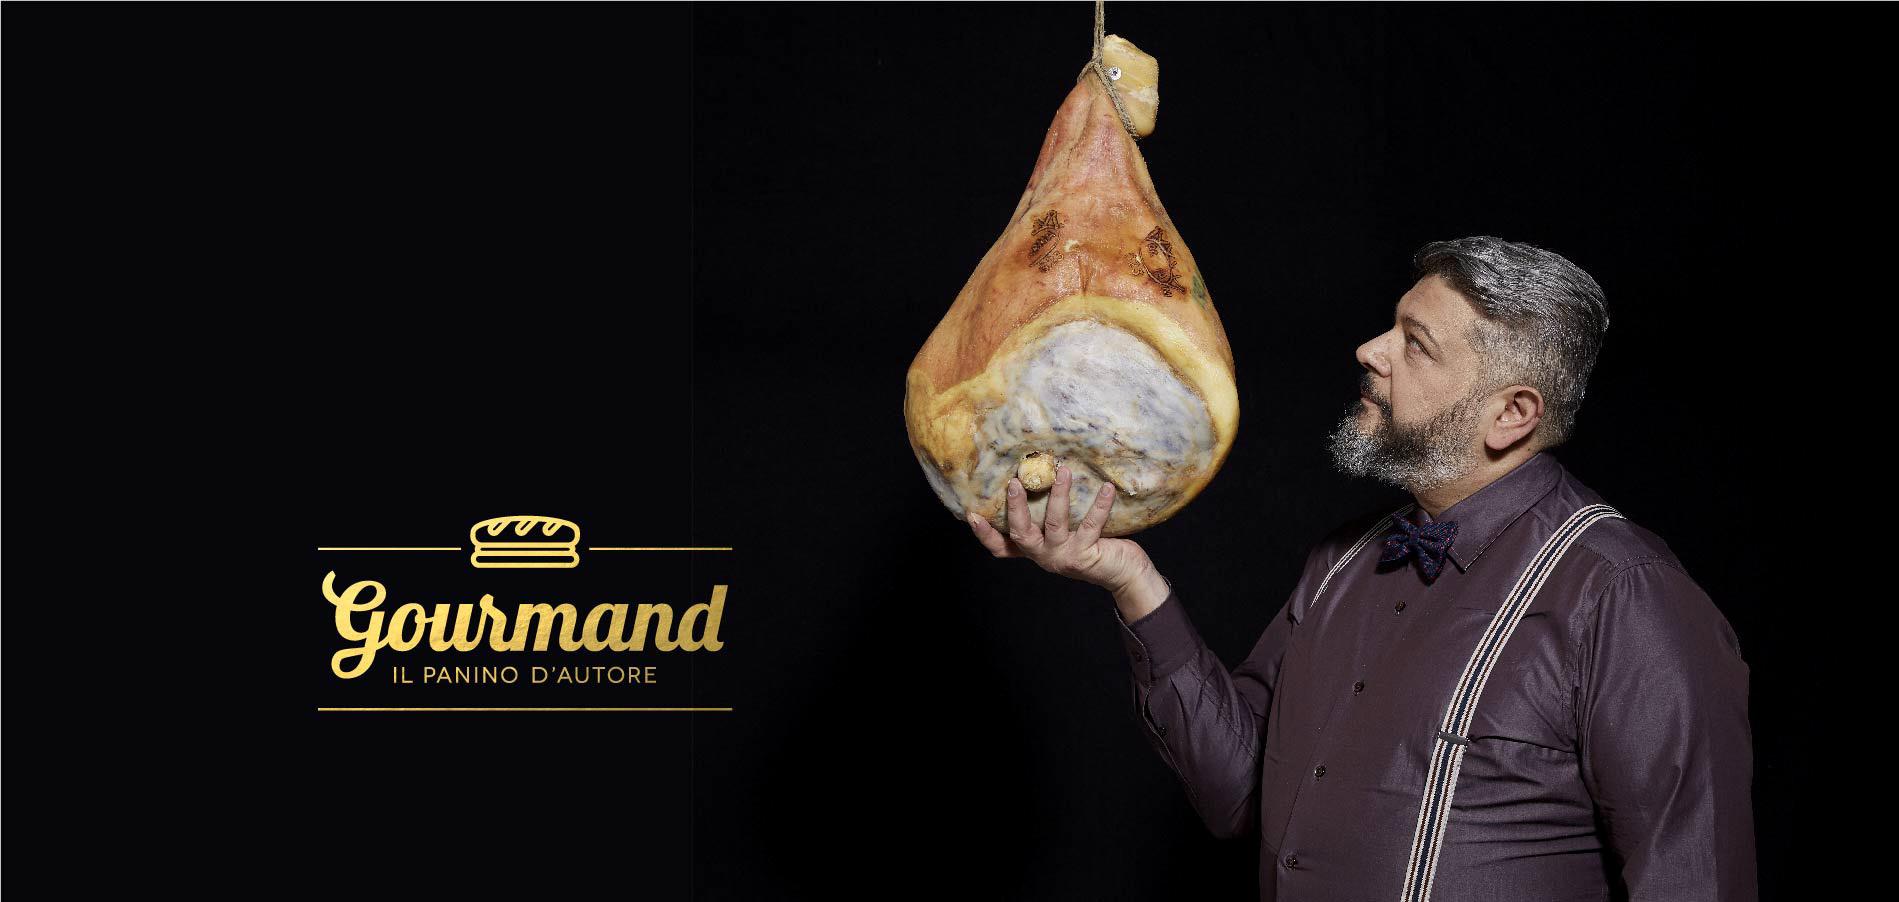 01-Gourmand-panino-autore-logo